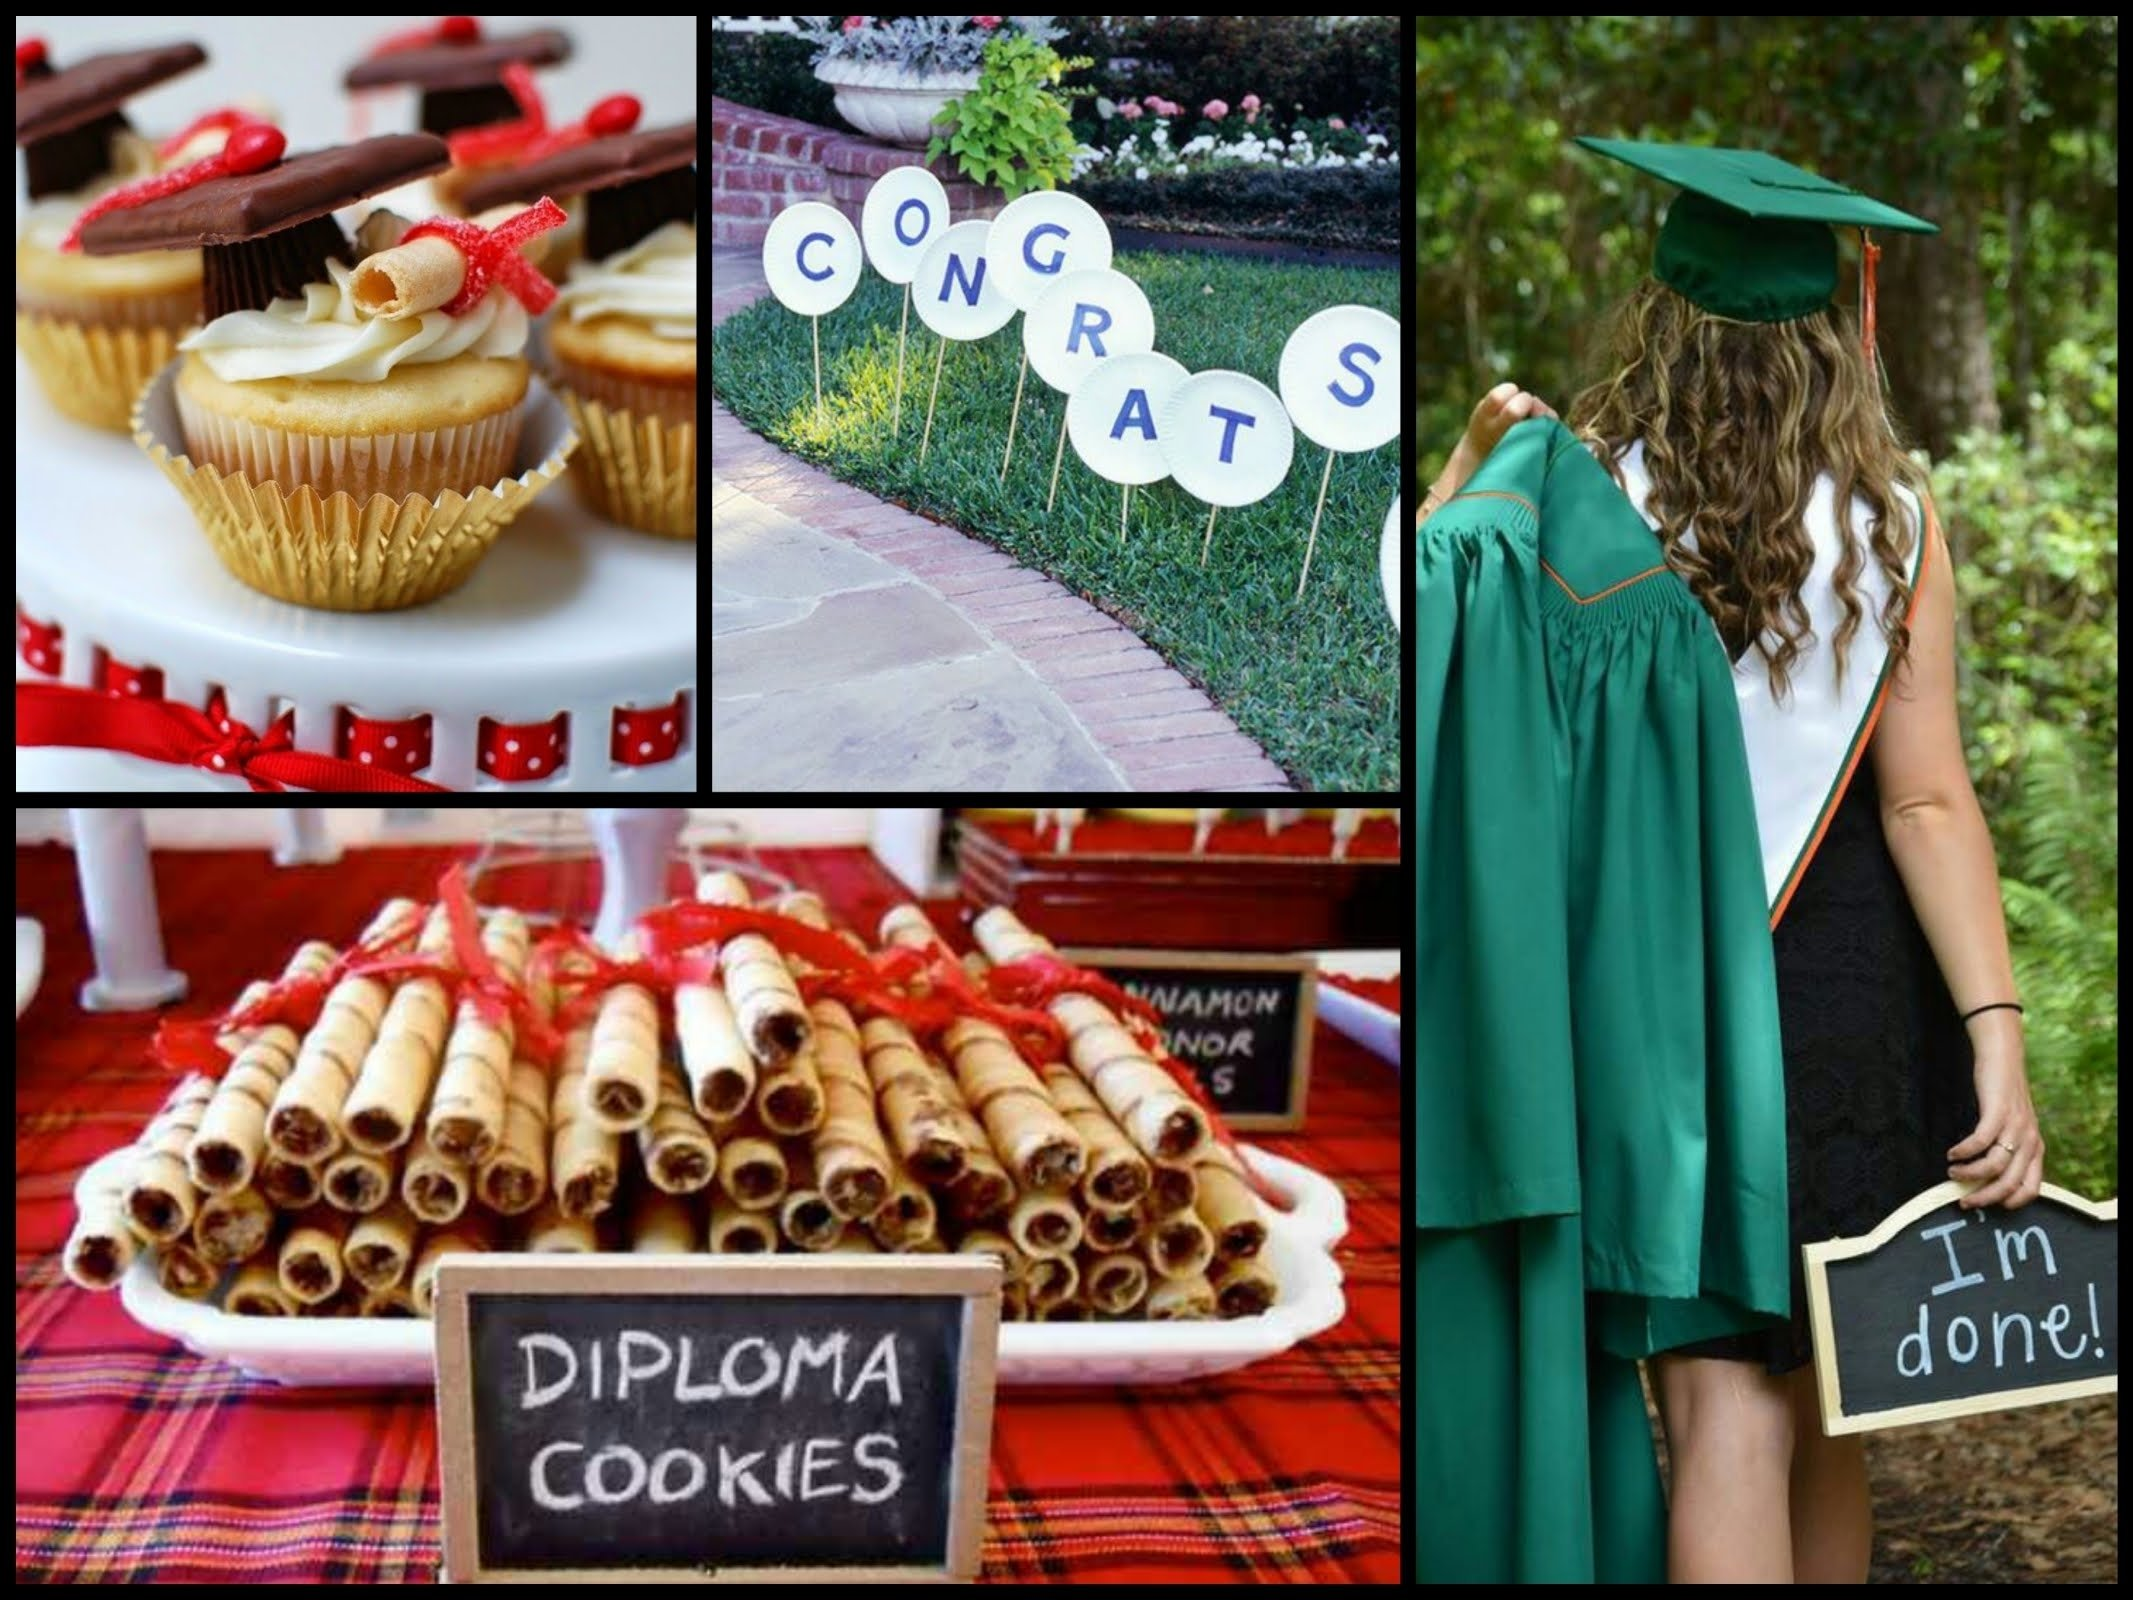 10 Stylish Graduation Open House Menu Ideas 25 diy graduation party ideas youtube 9 2020